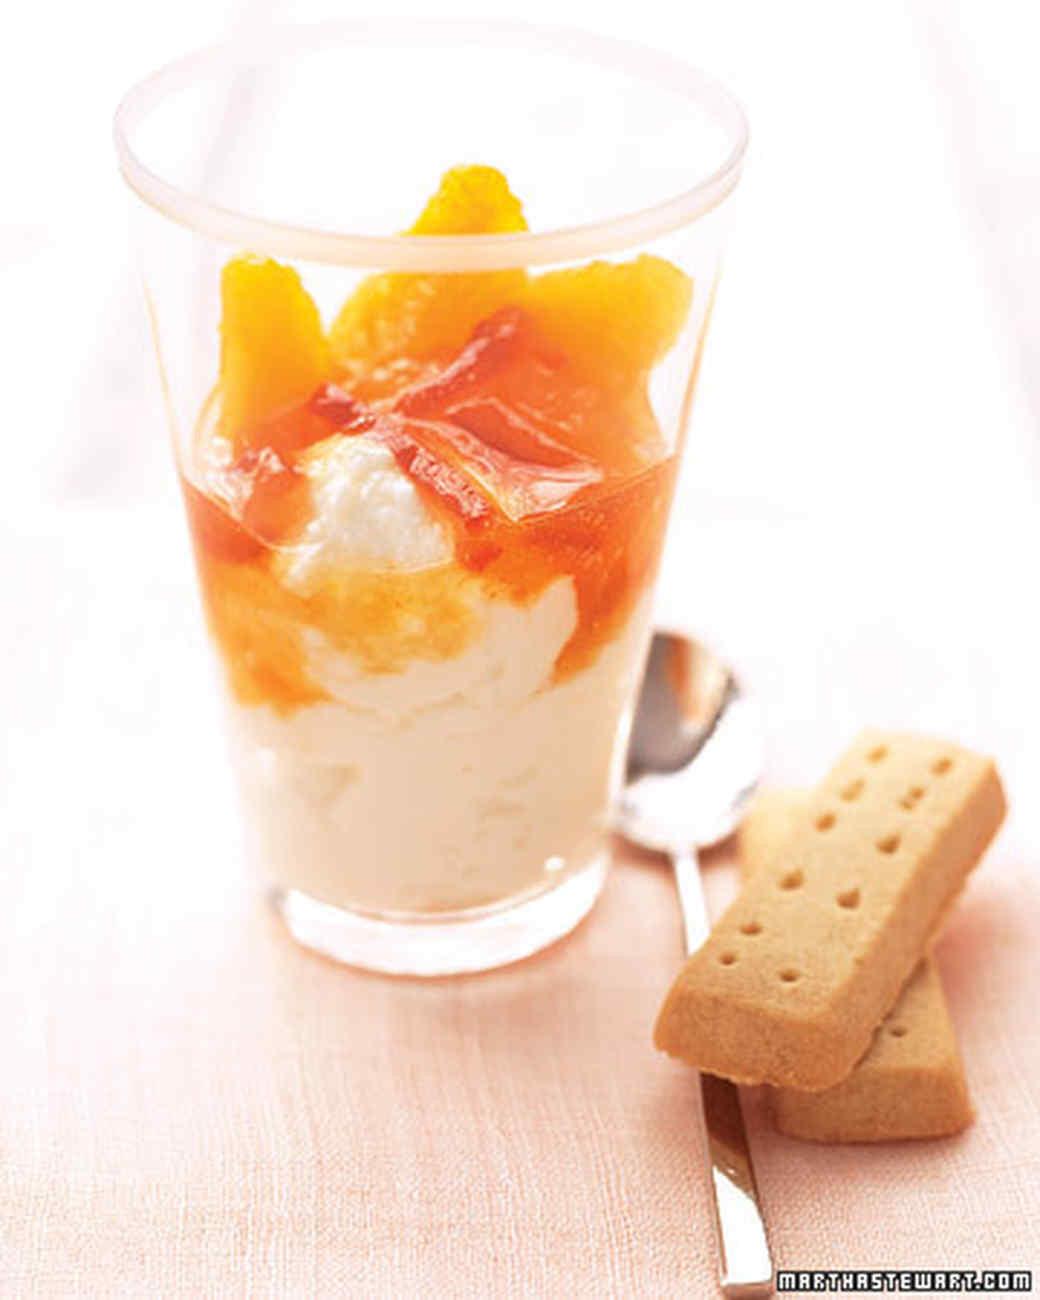 Fruit Dessert Recipes  Easy Fruit Dessert Recipes